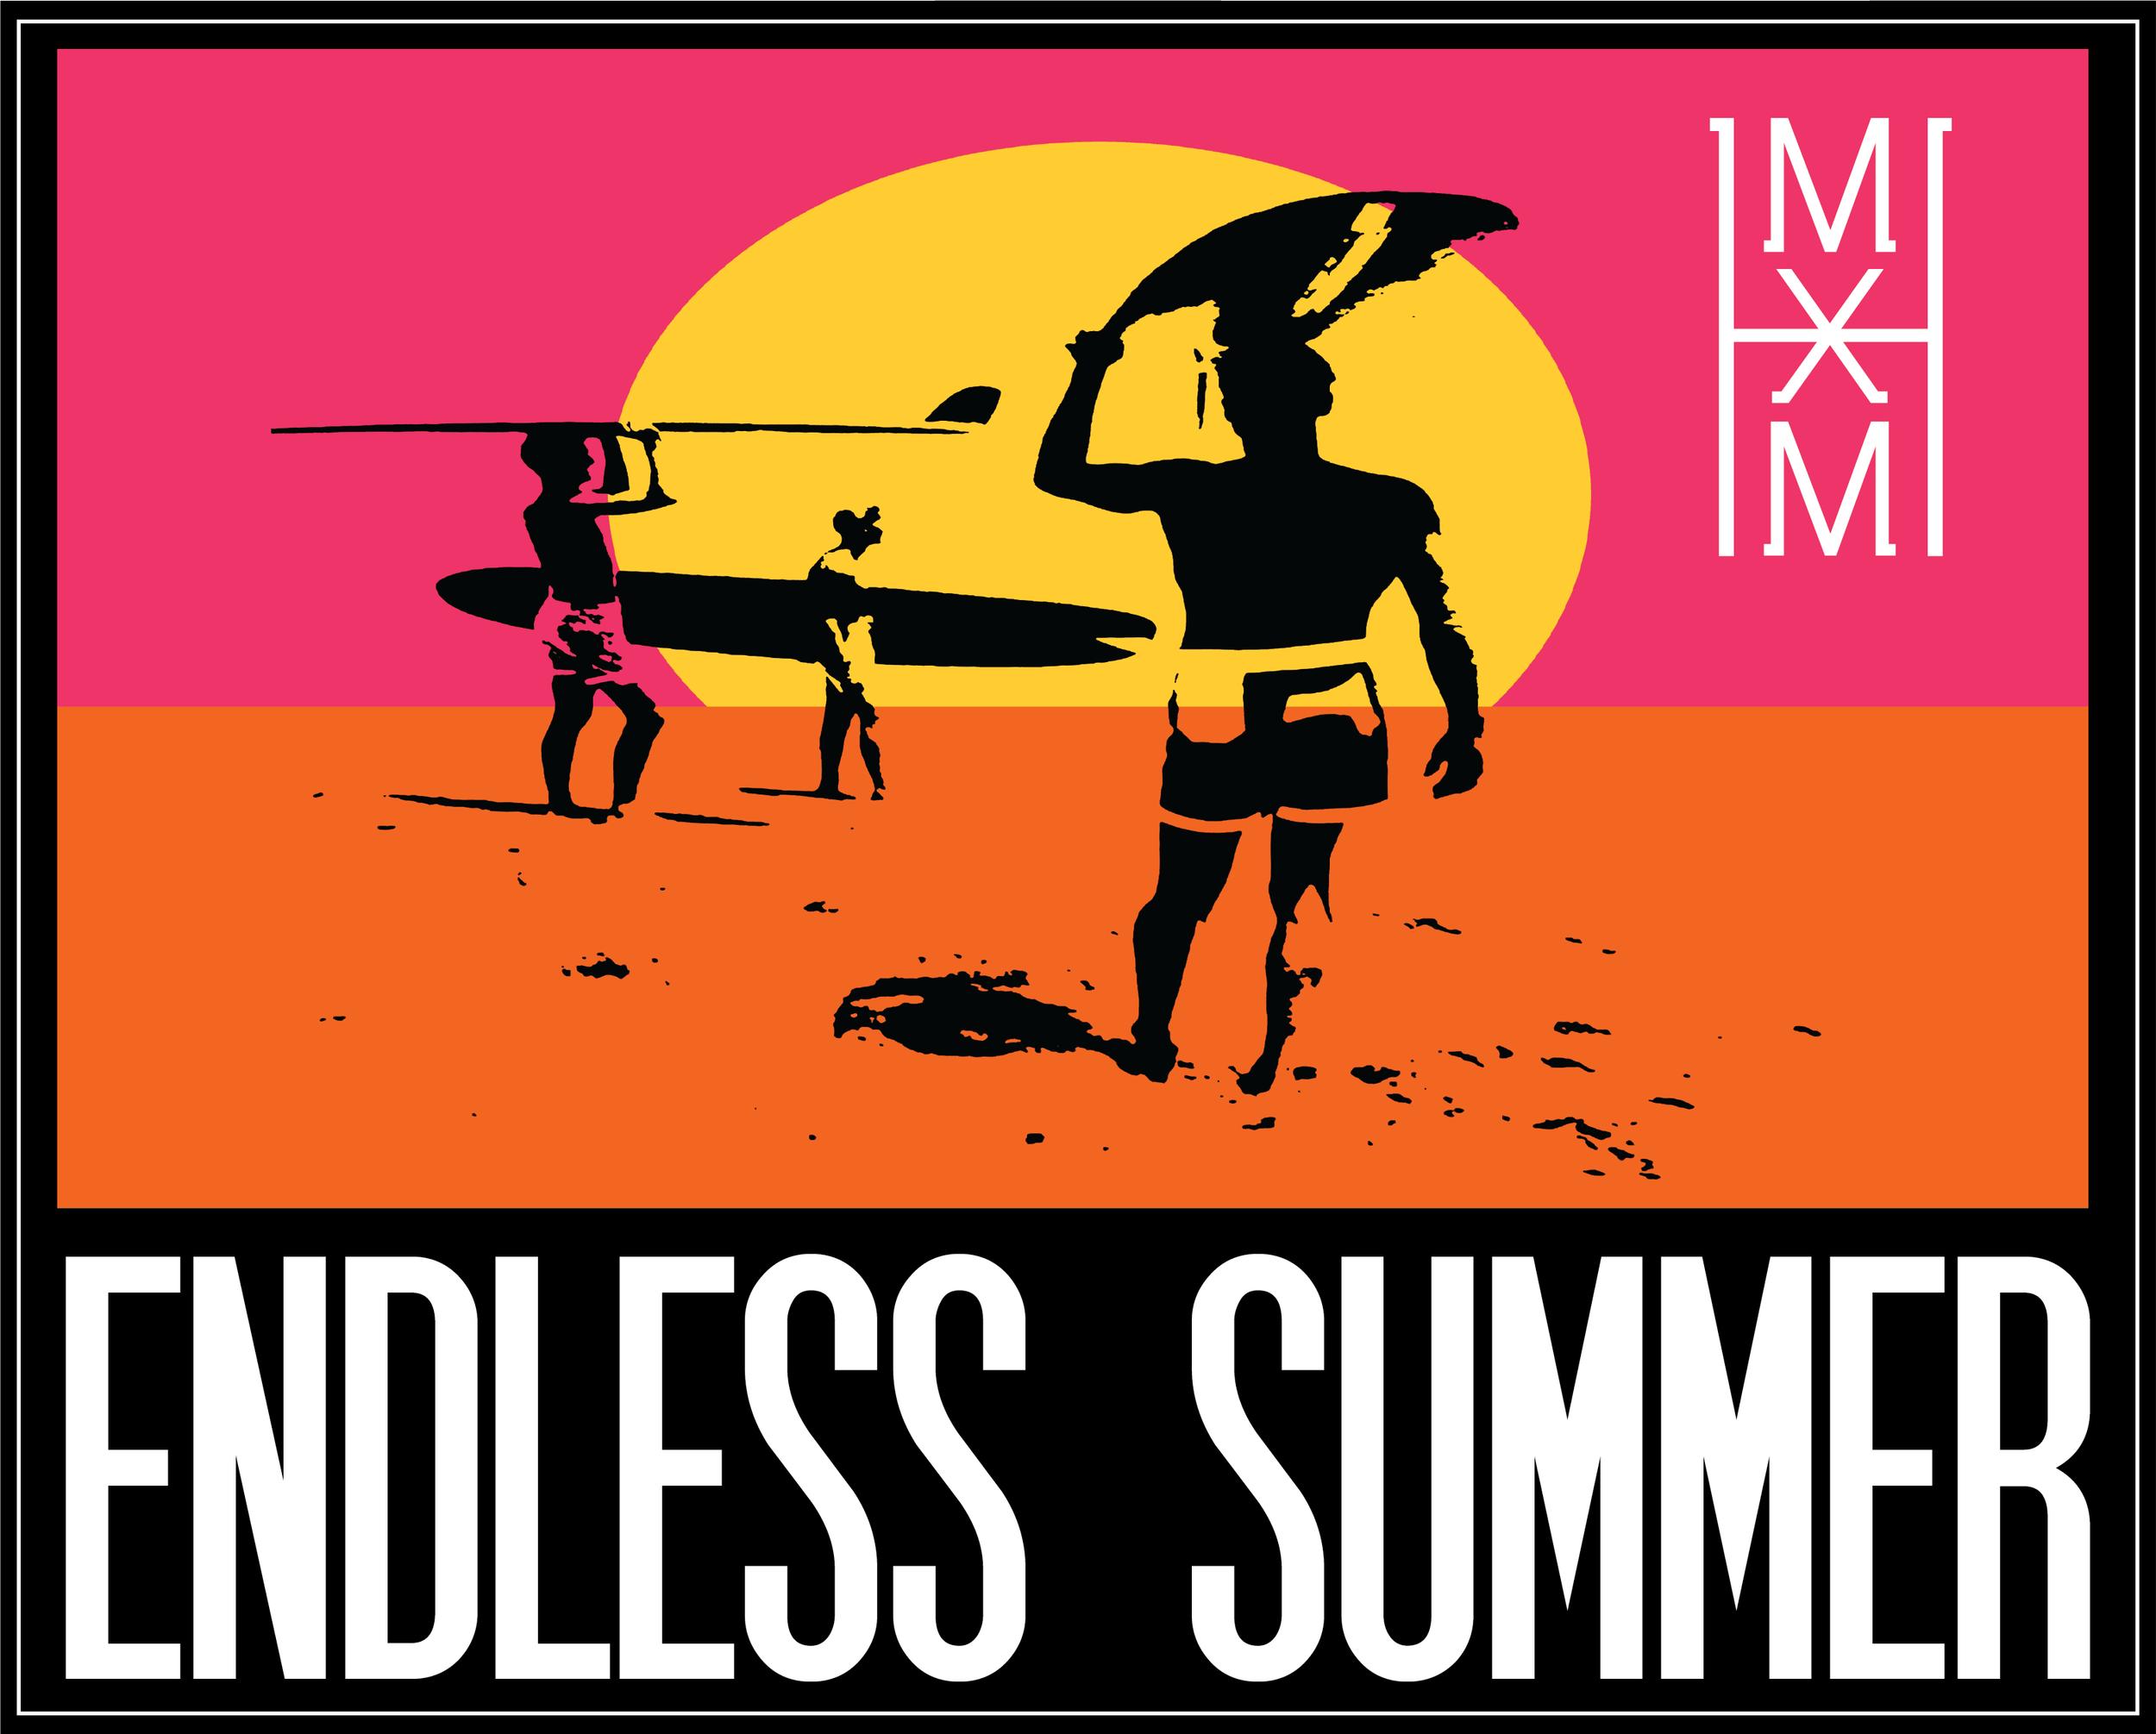 ENDLESS SUMMER-07.png